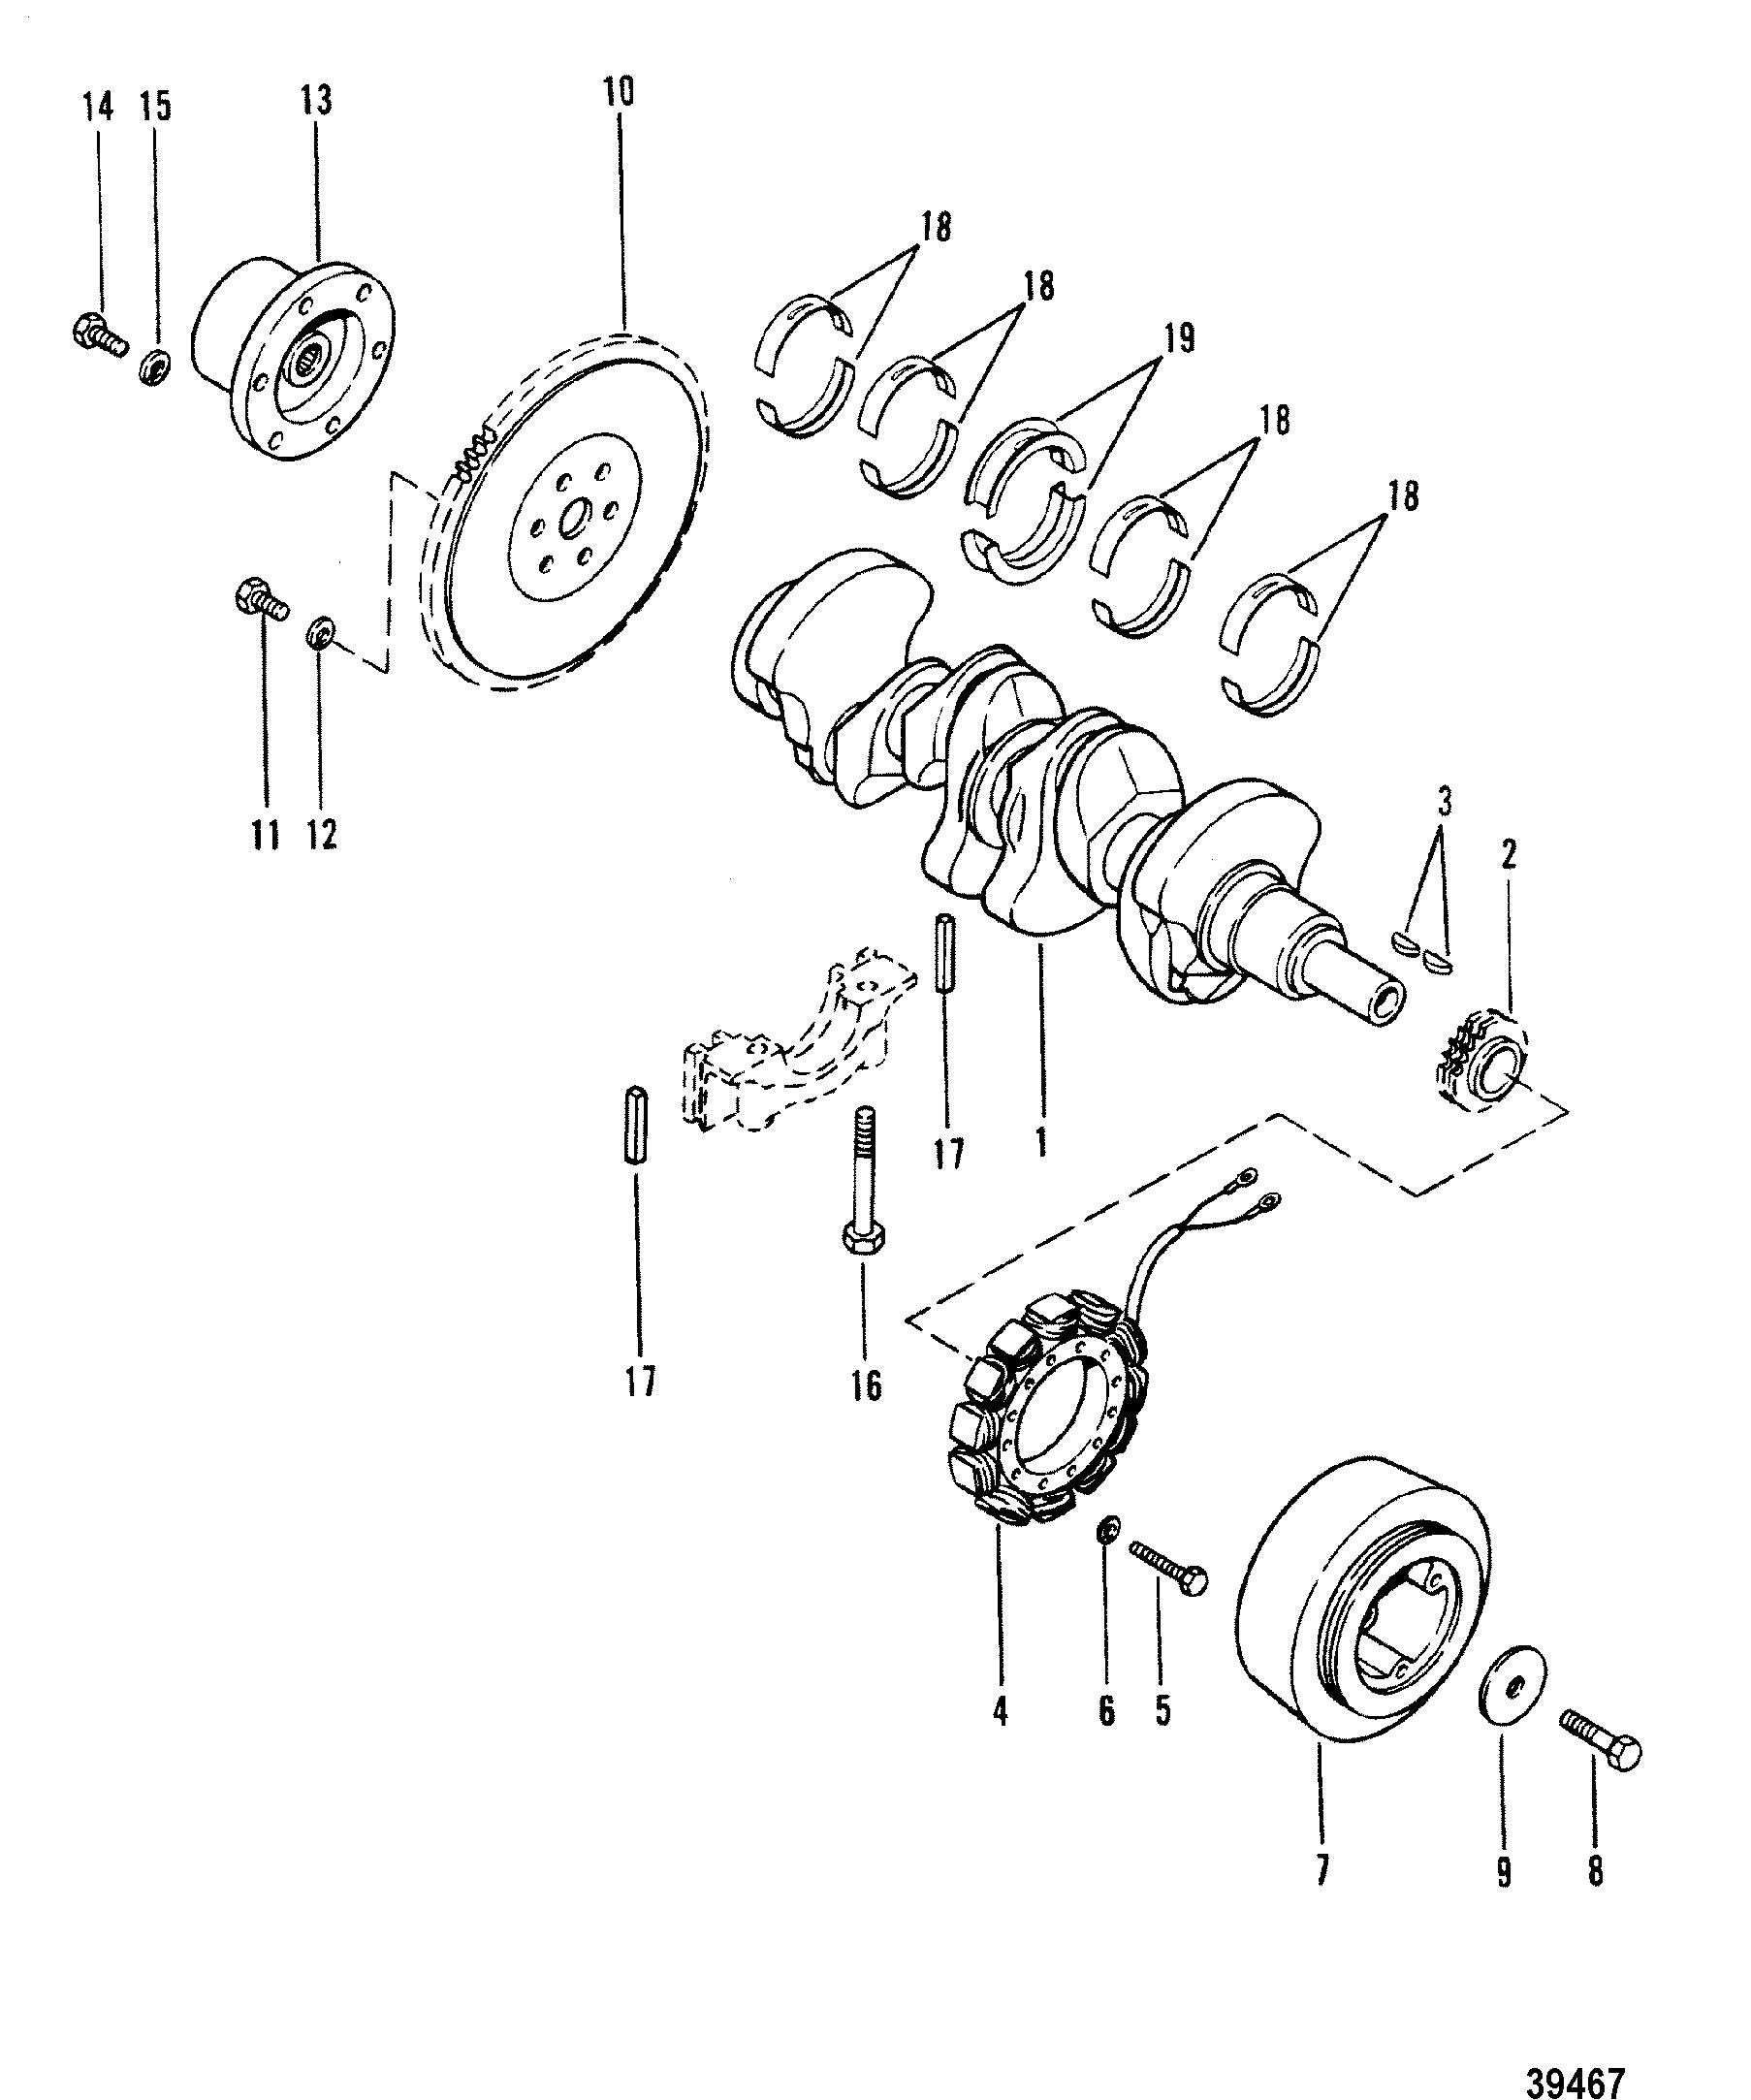 165 hp mercruiser engine diagram wiring diagrams hubs Inside a Distributor crankshaft flywheel and alternator for mercruiser 165 hp 3 7l 170 mercruiser solenoid wiring diagram 165 hp mercruiser engine diagram